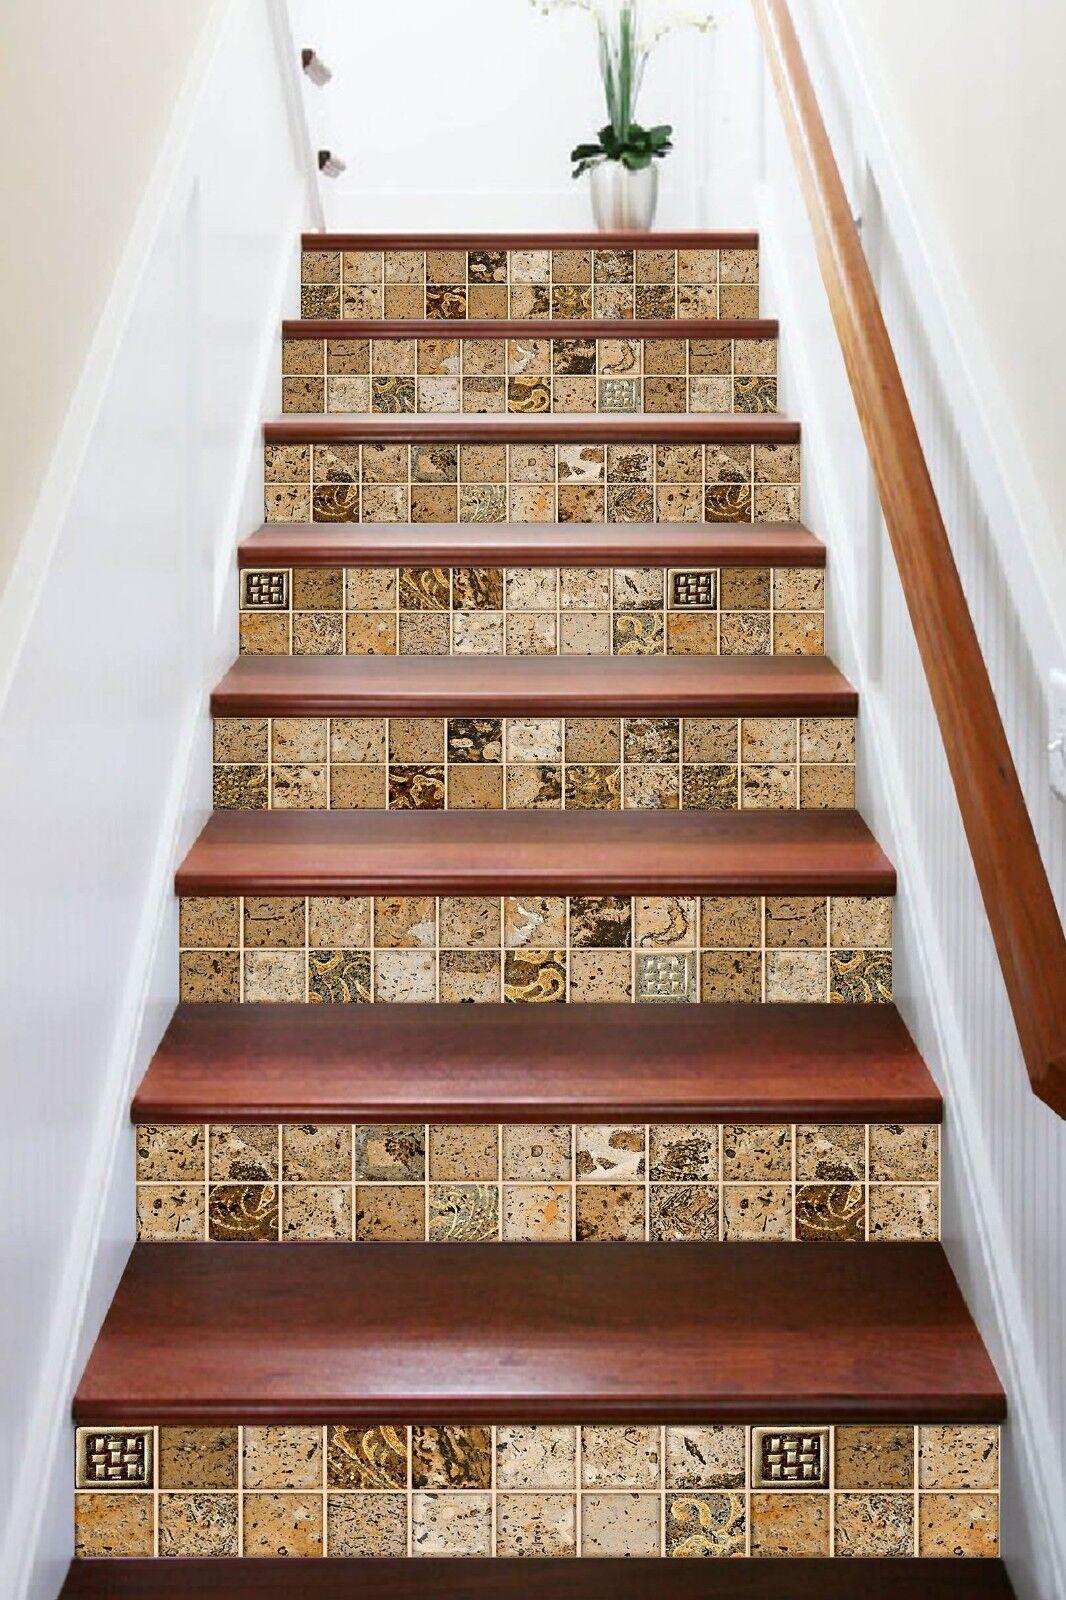 3D marron Pattern 1 Tile Marble Stair Risers Decoration Vinyl Wallpaper Mural